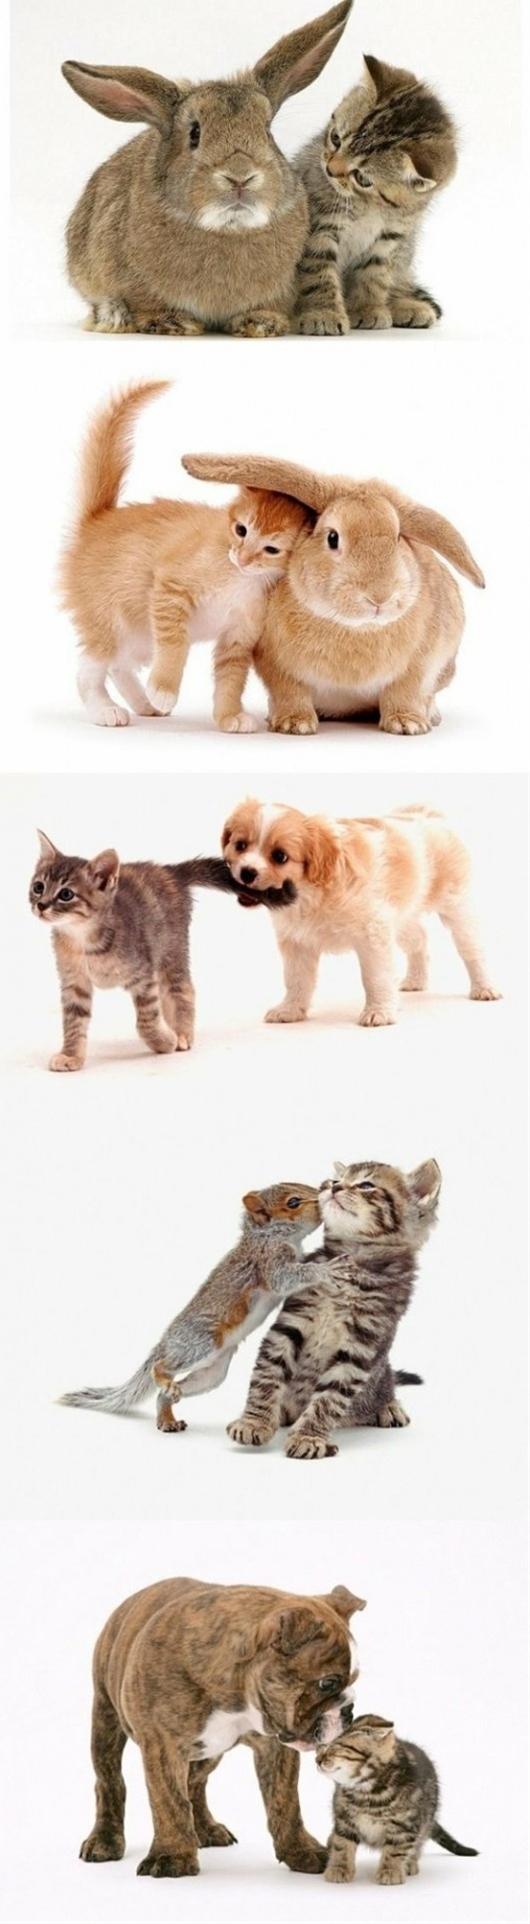 Baby animal love!